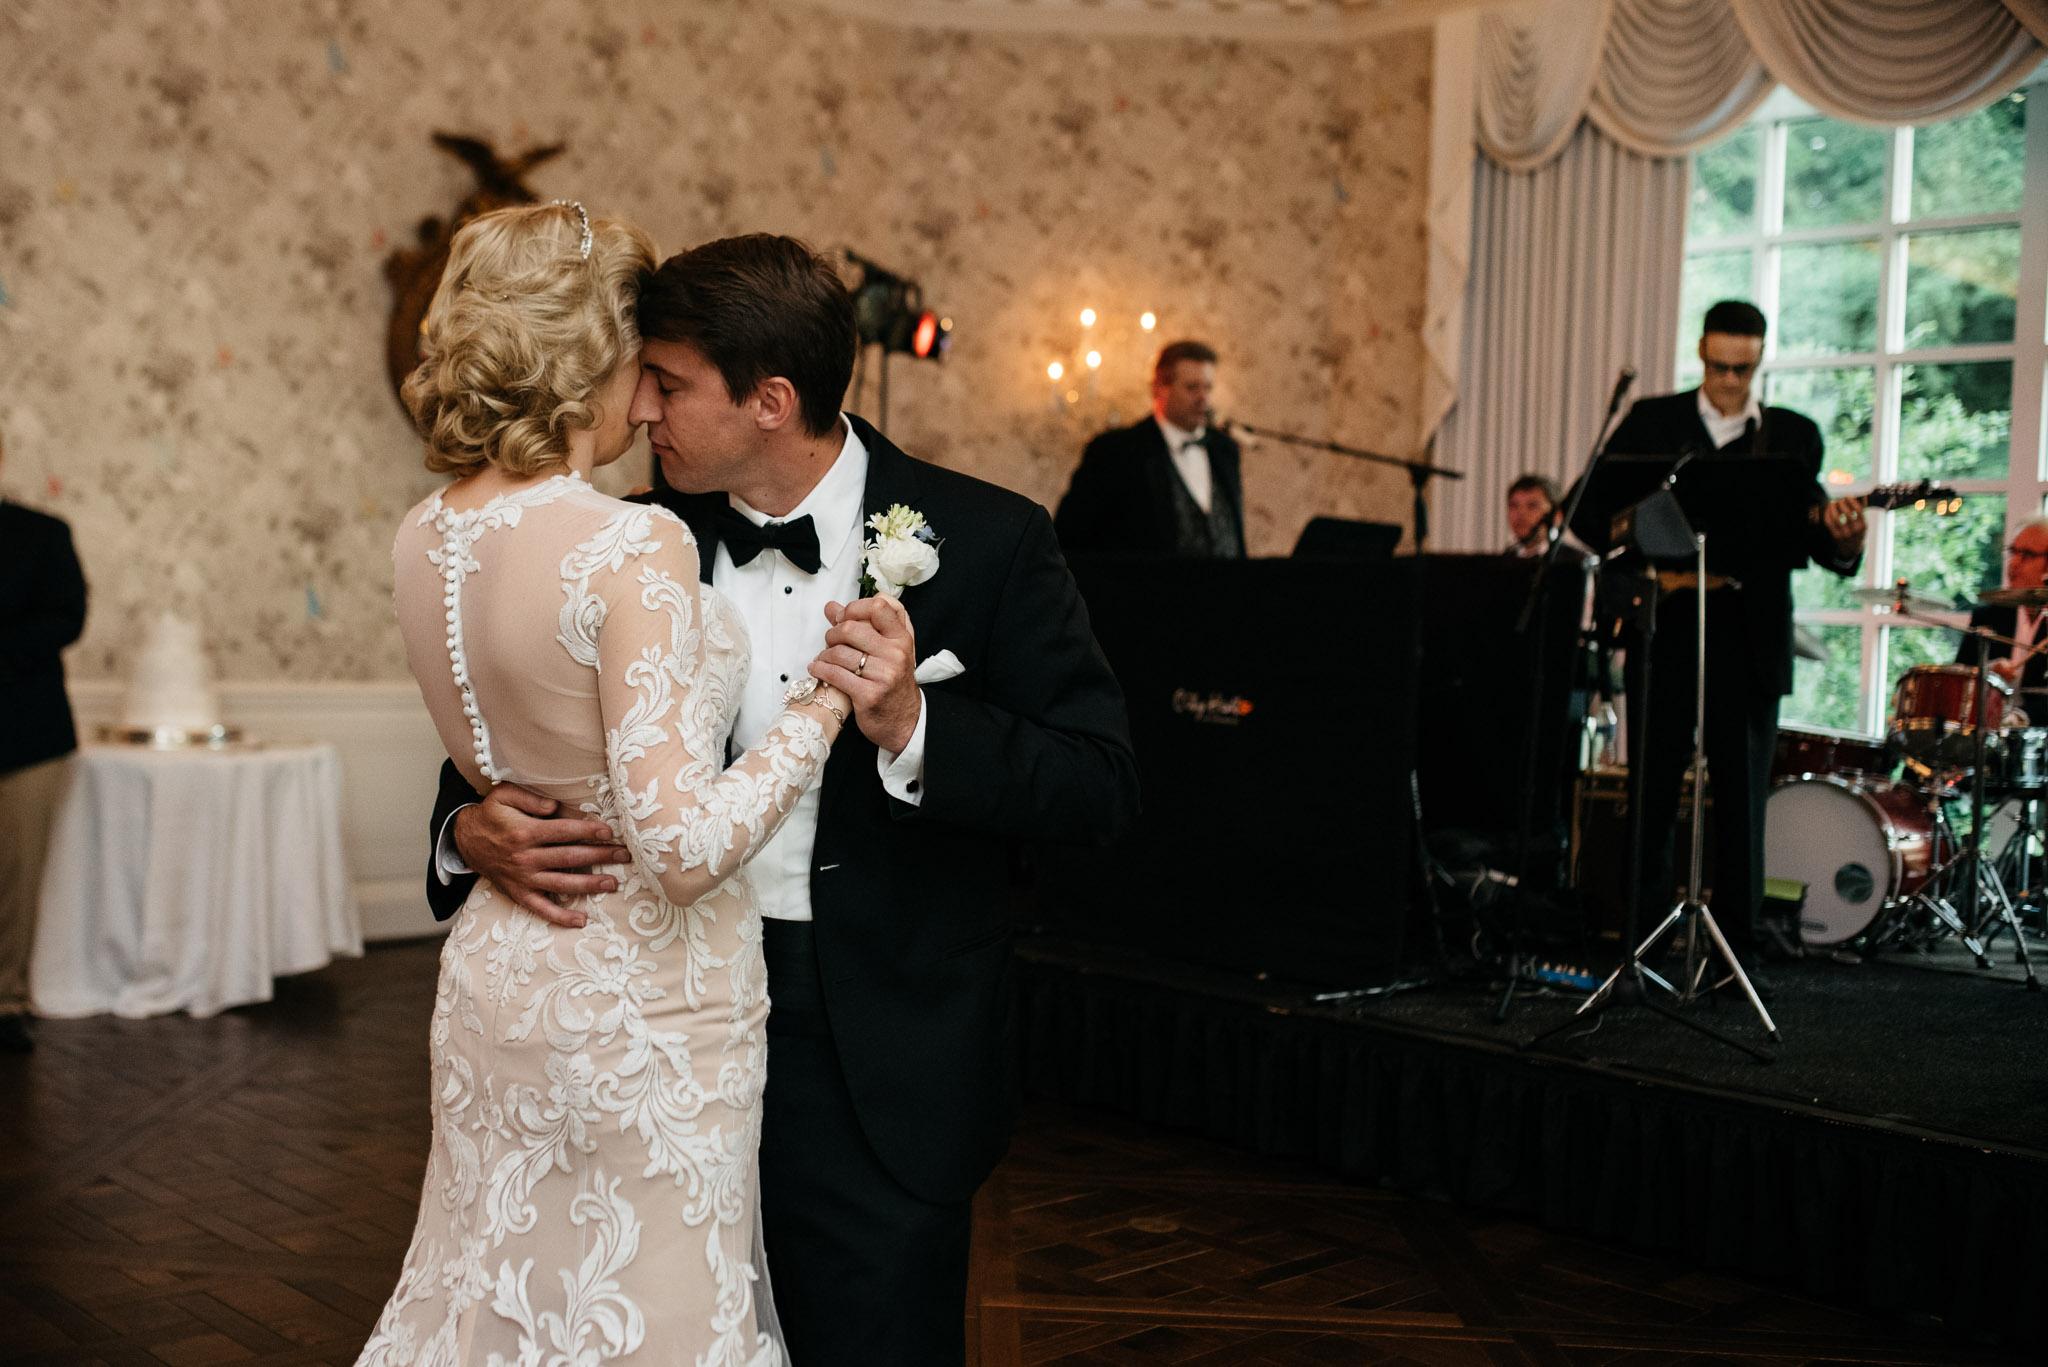 Ligonier & Pittsburgh wedding photographer mariah fisher-12.jpg